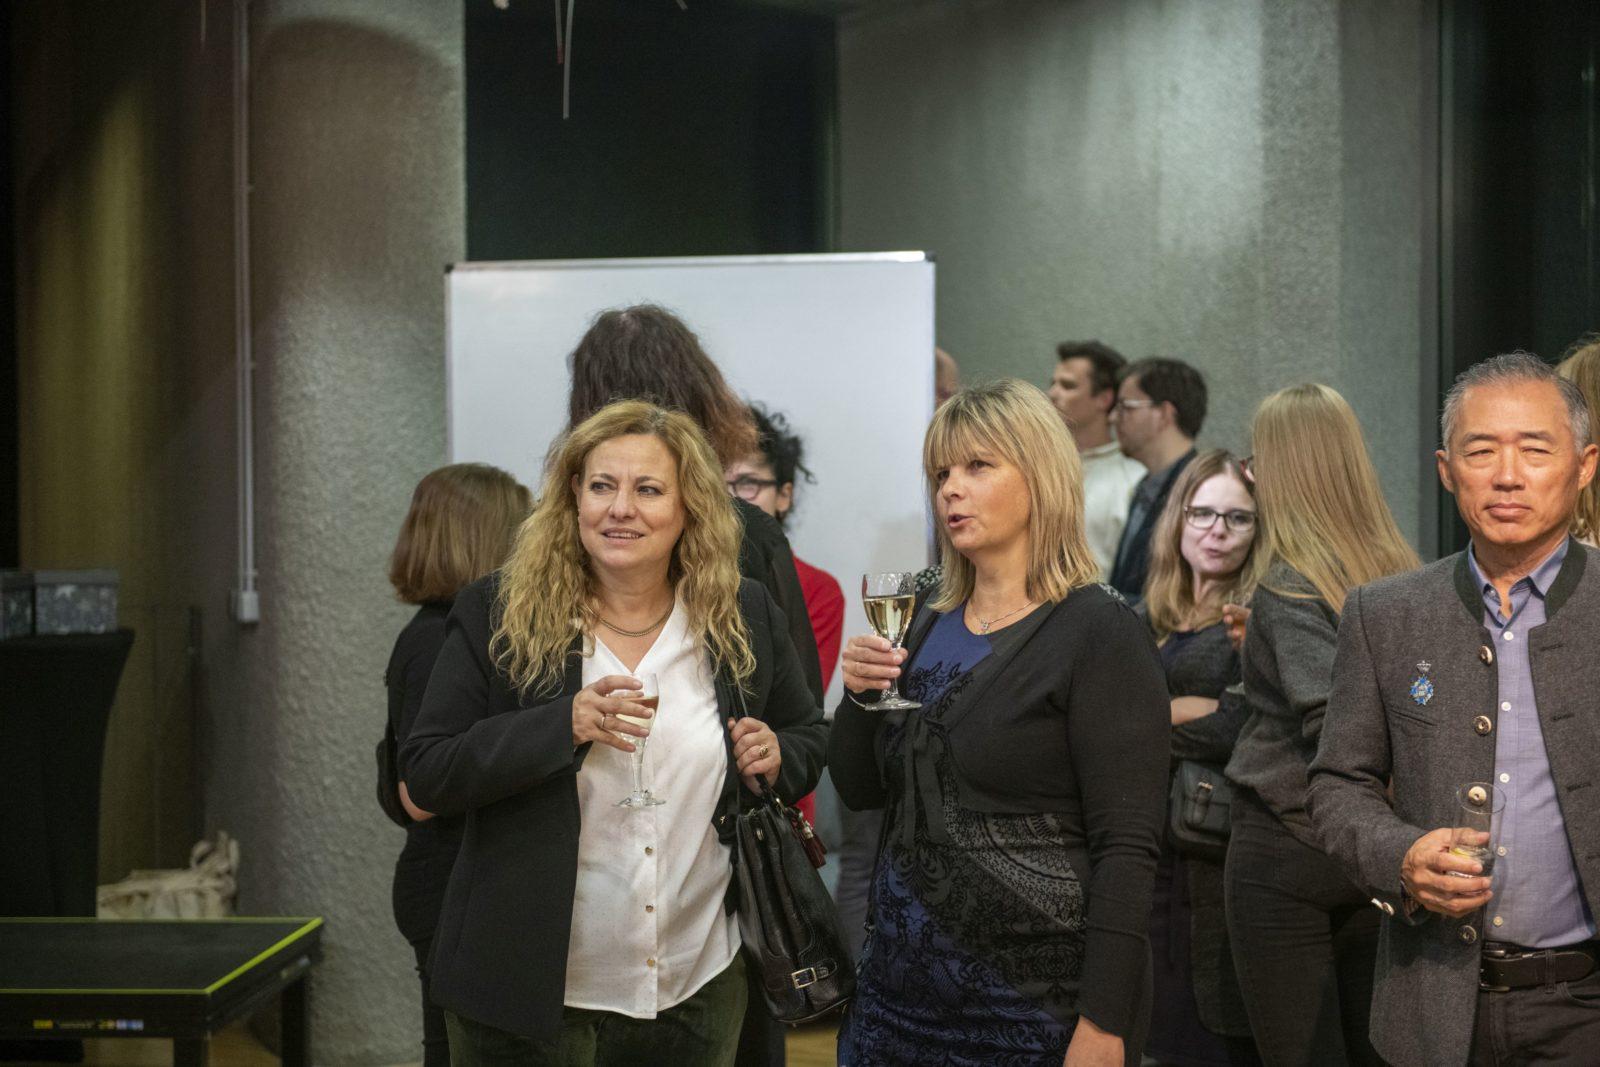 Warschau_2019_Empfang_reception_Thursday_Warsaw_Stasiuk_Konrad_086